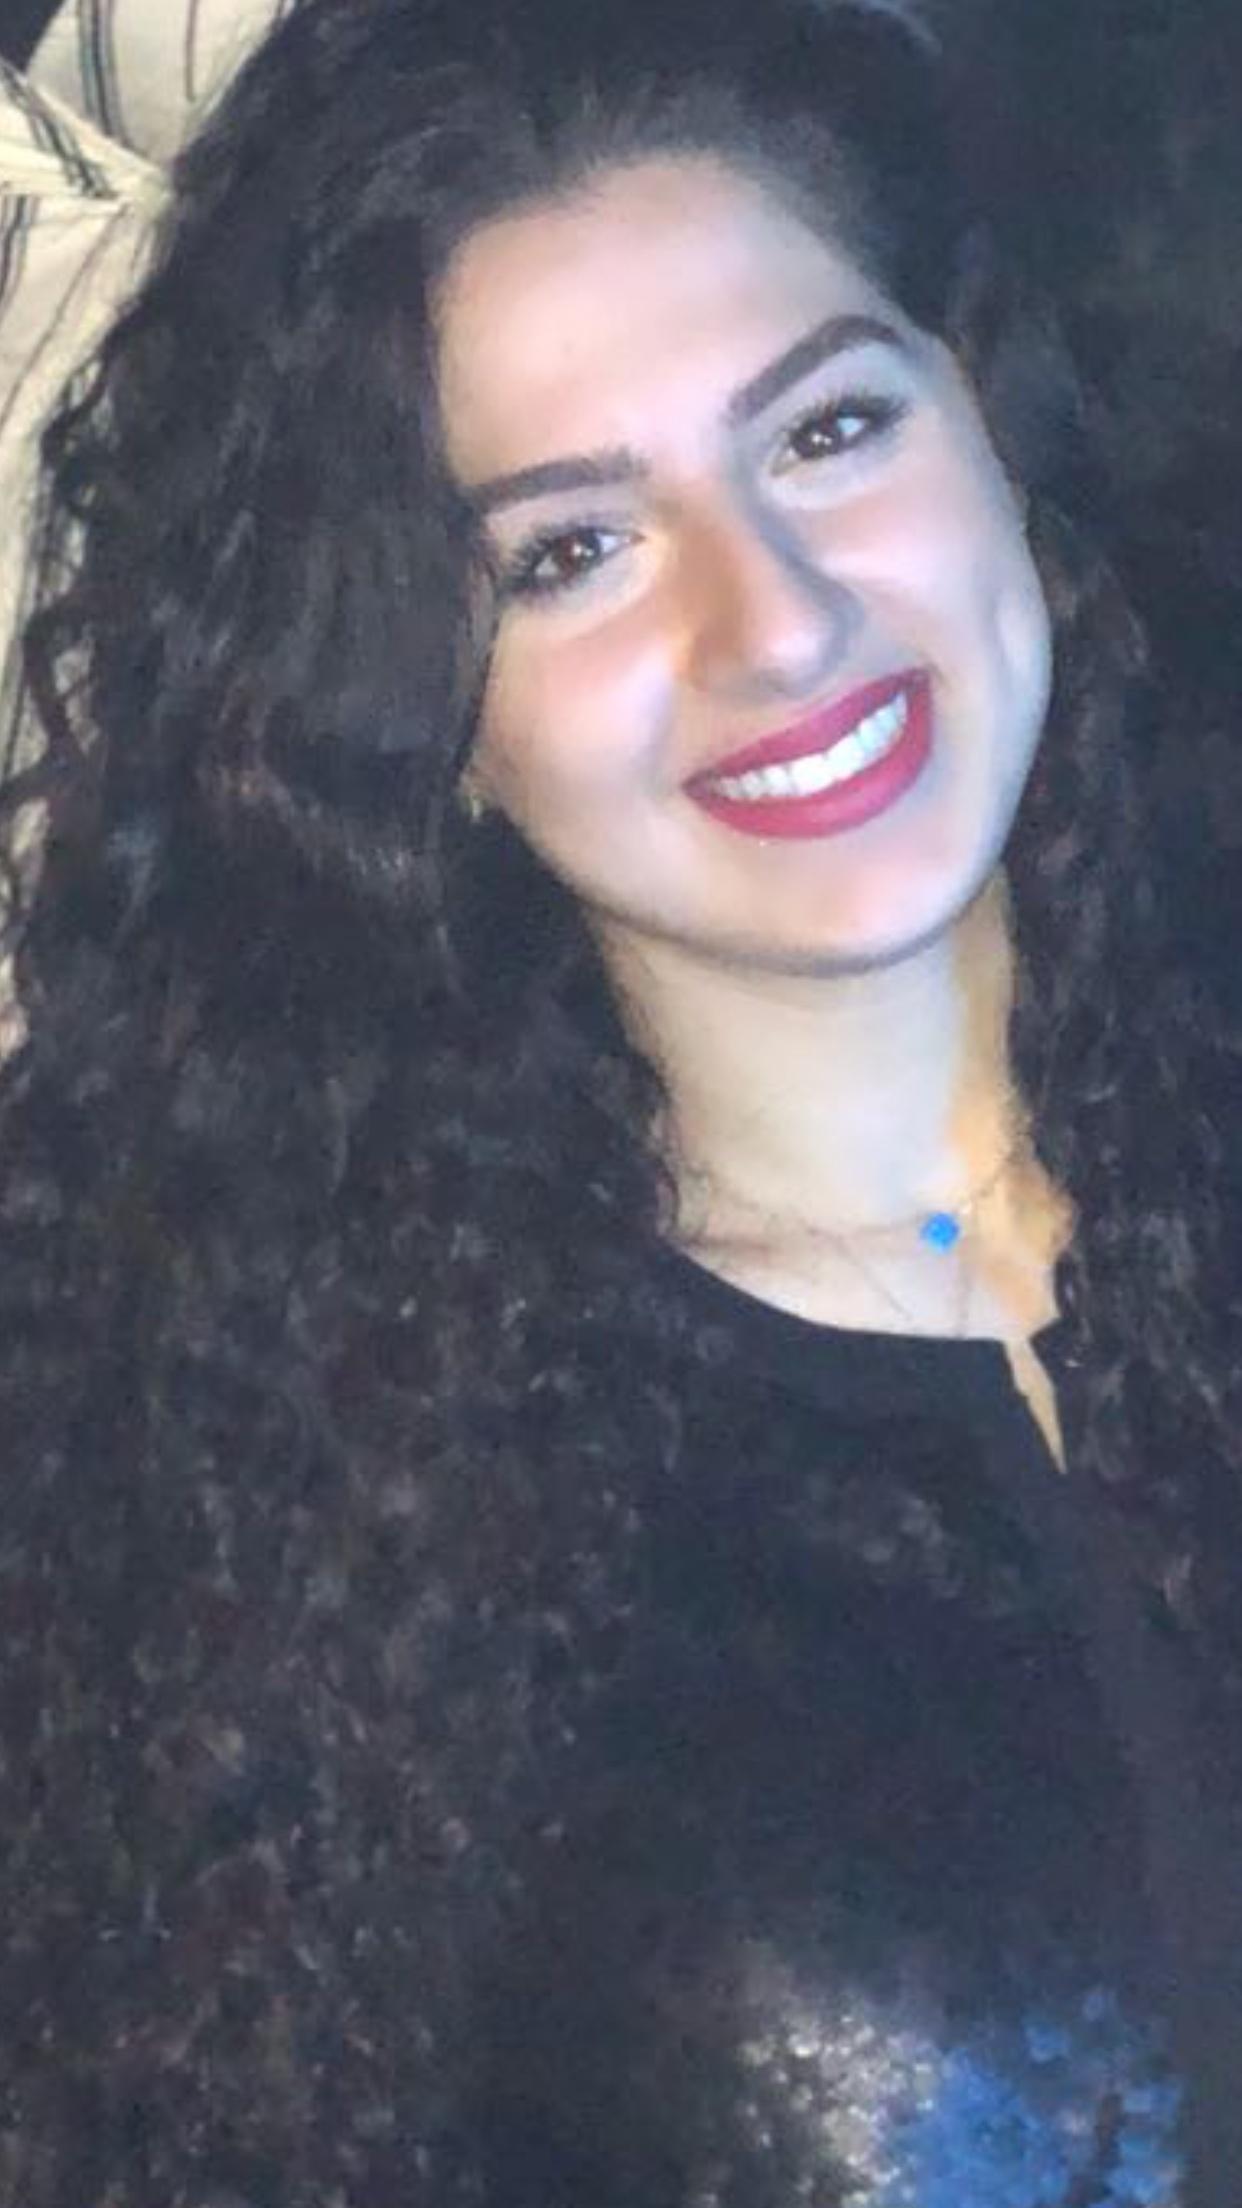 SugarBaby profile sultana_mayline